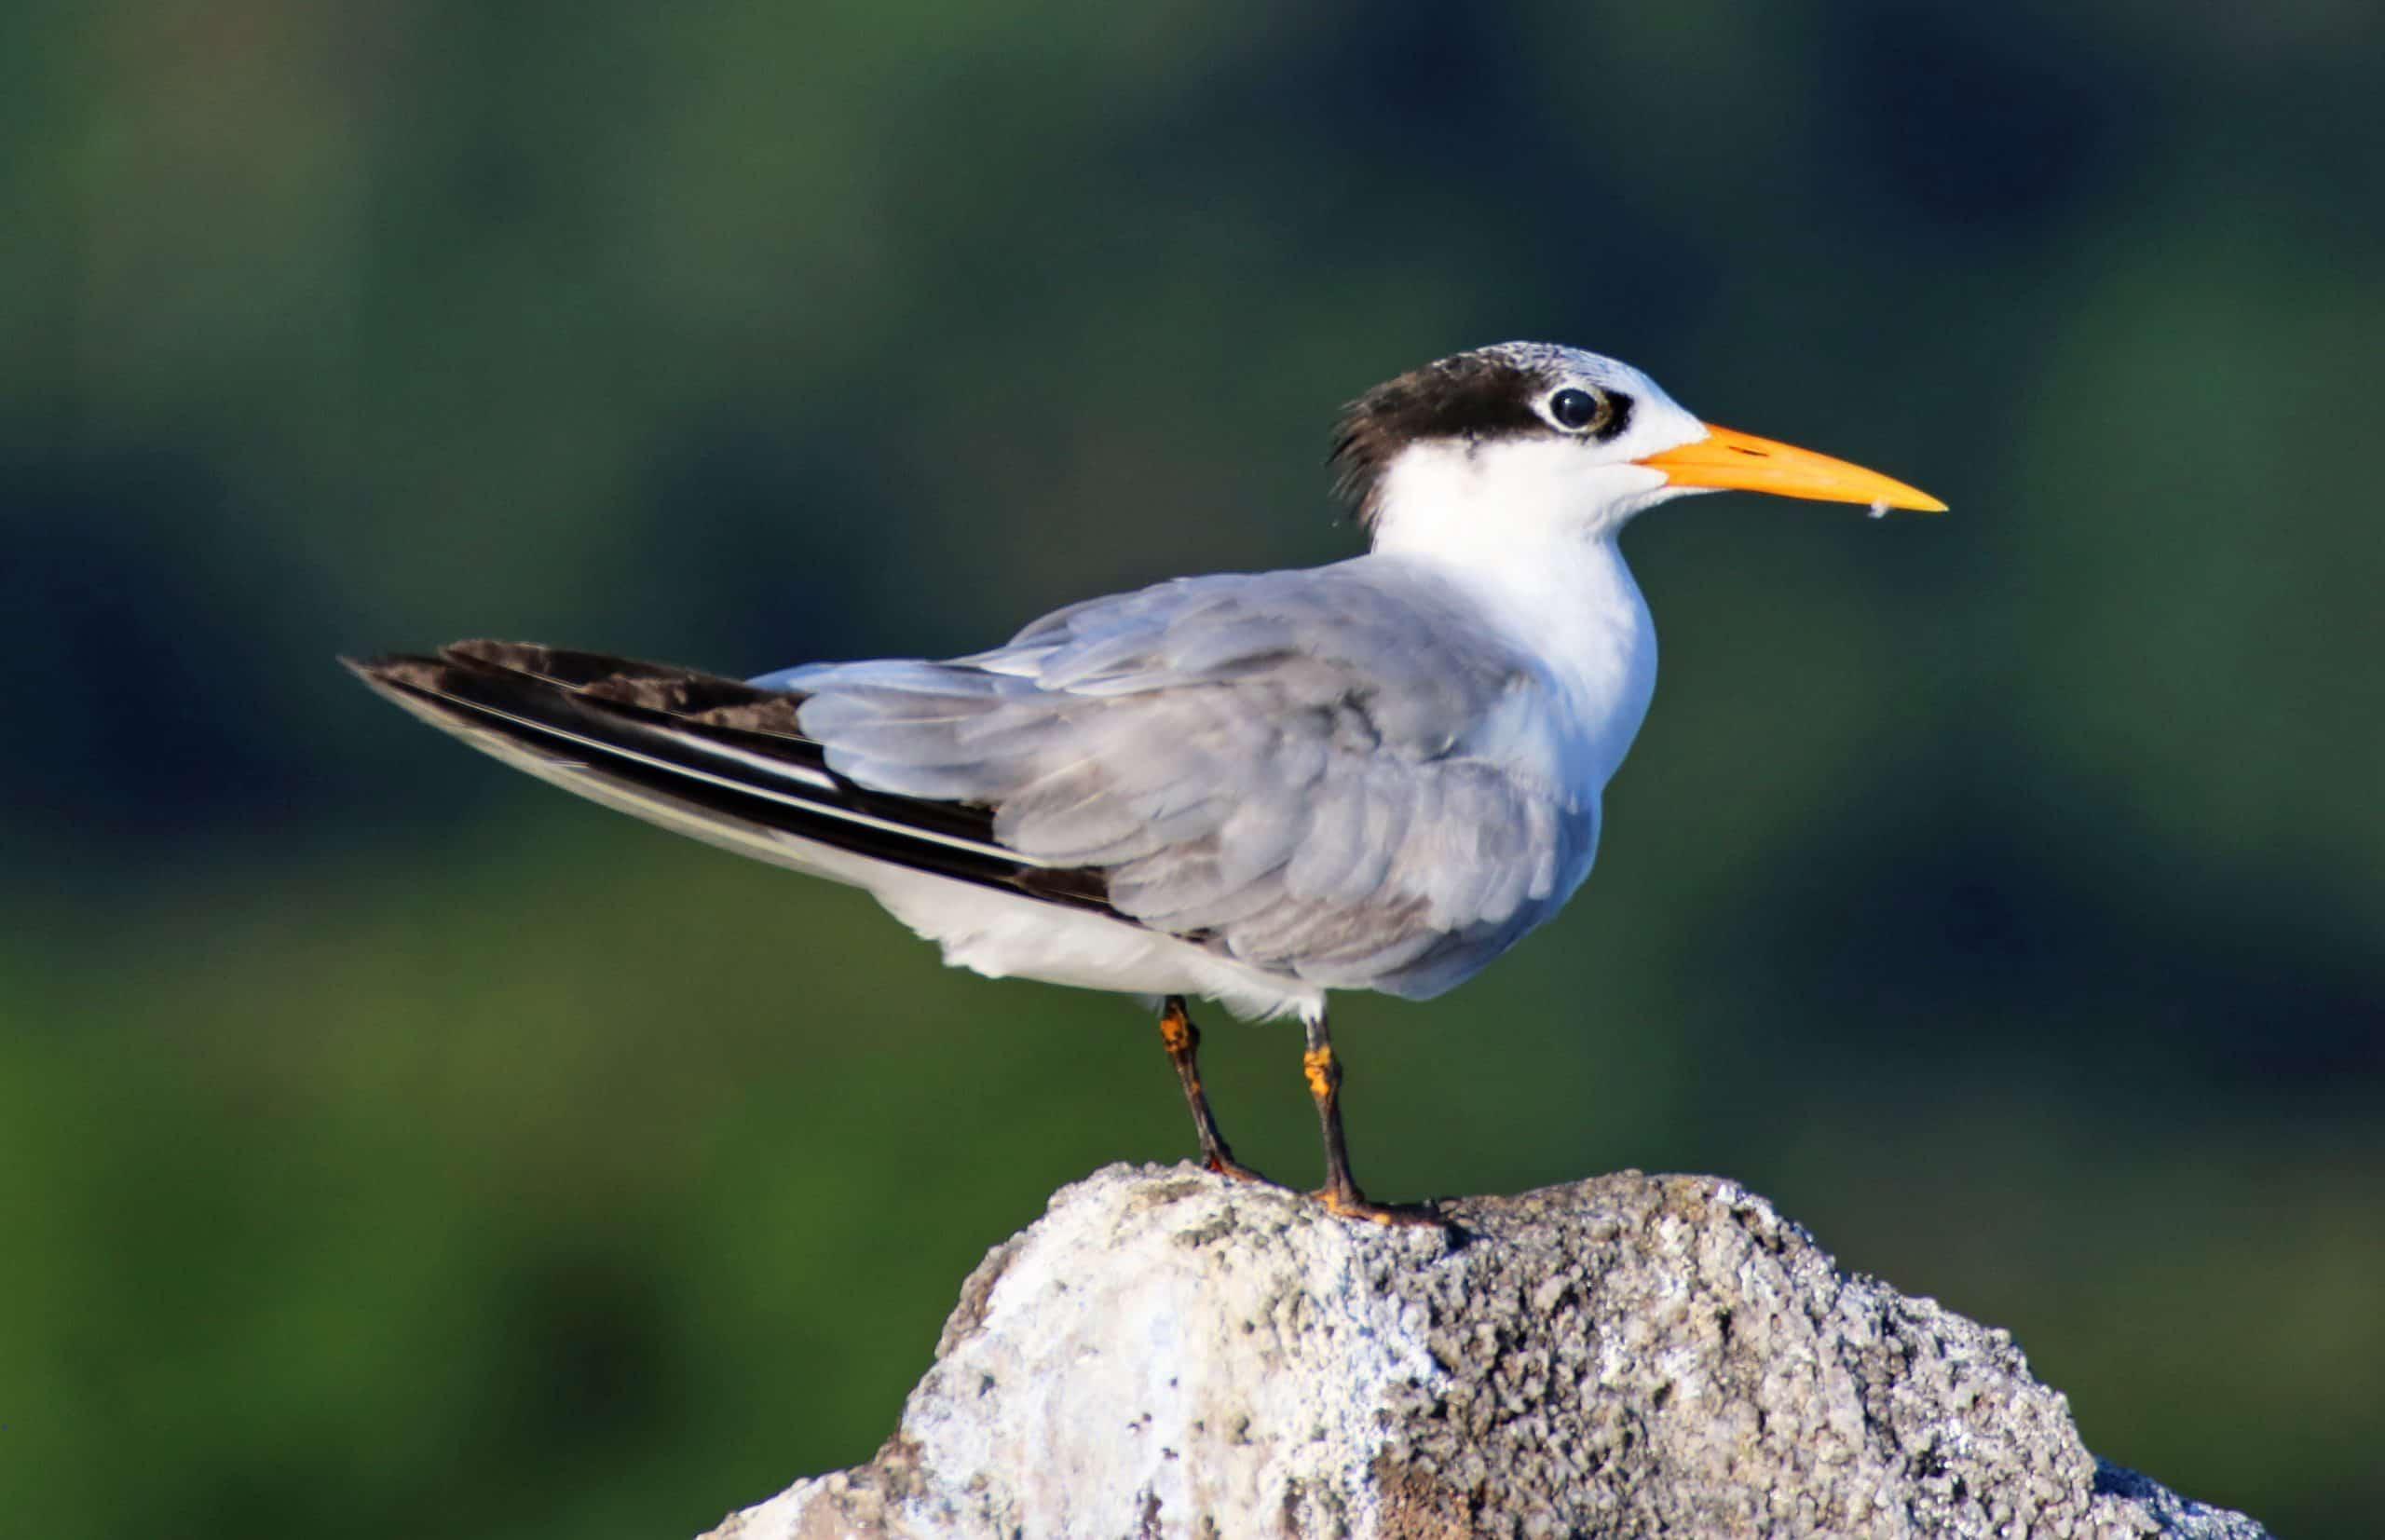 Img 05 (168) Greater Crested Tern (swift Tern) (thalasseus Bergii)